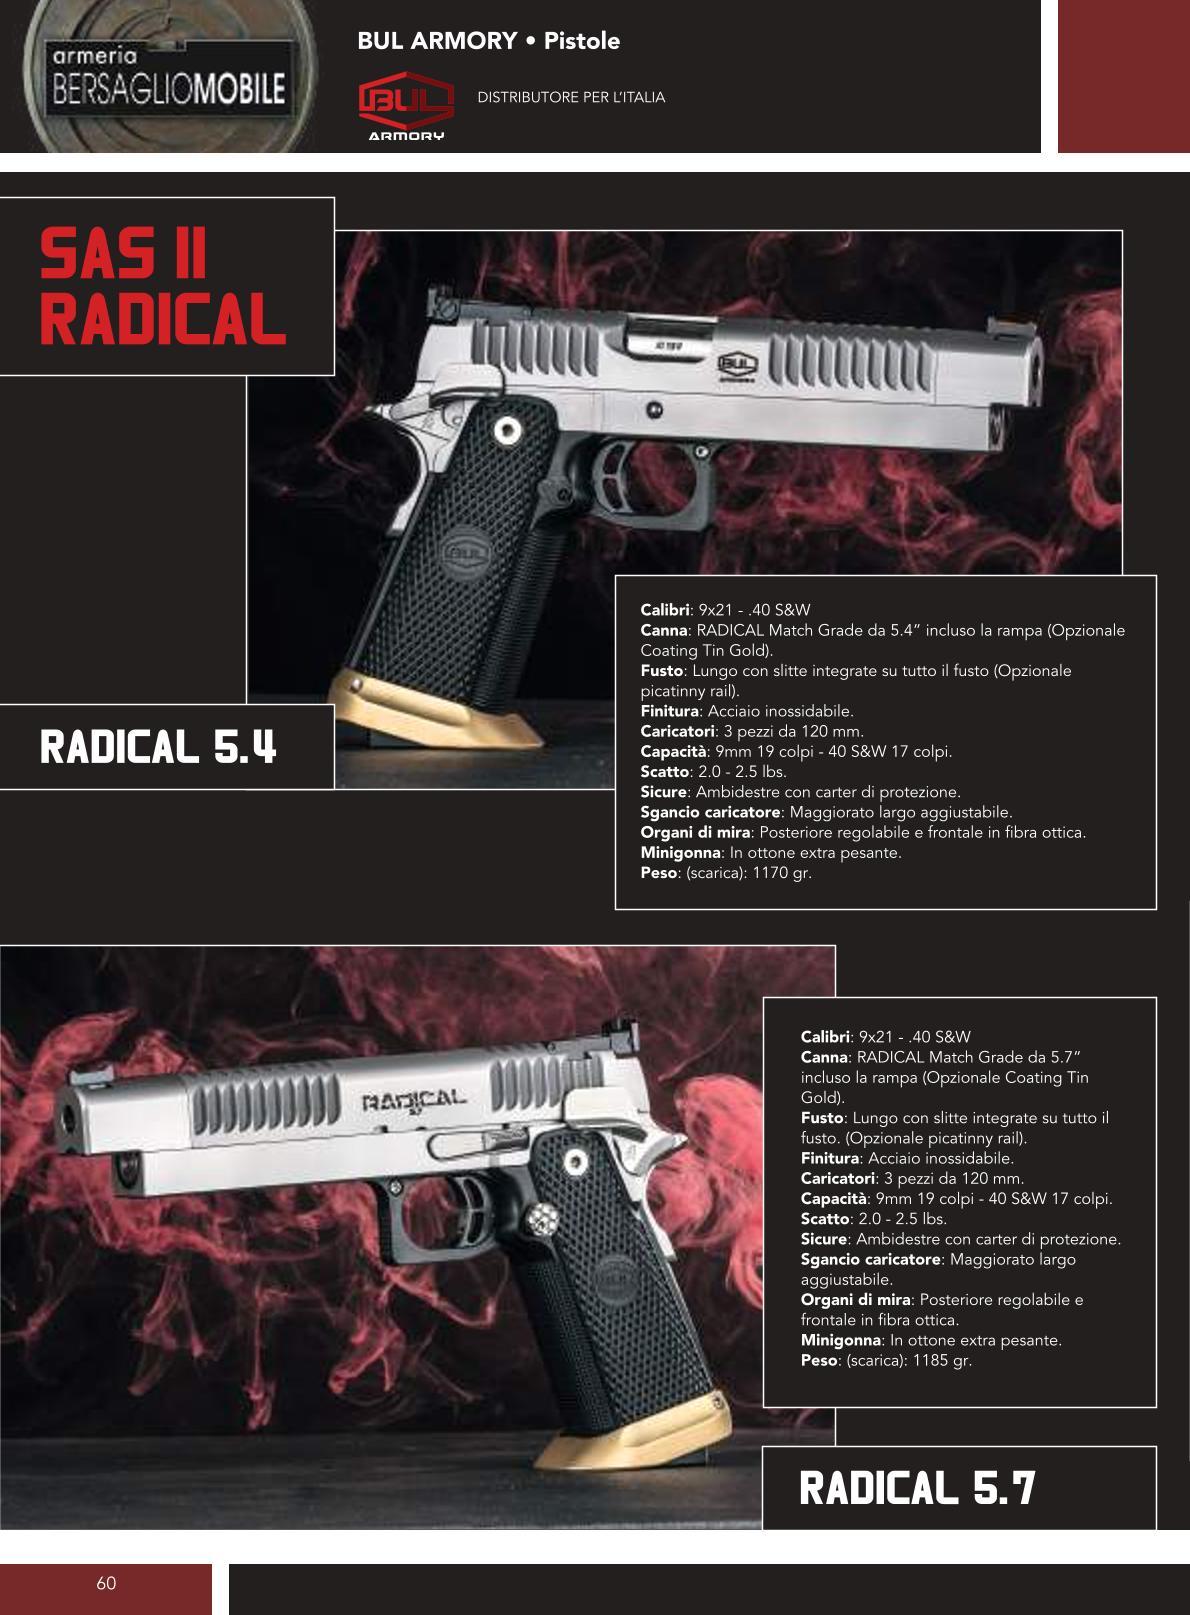 Bul Armory - Sas II Radical - Armeria Bersaglio Mobile